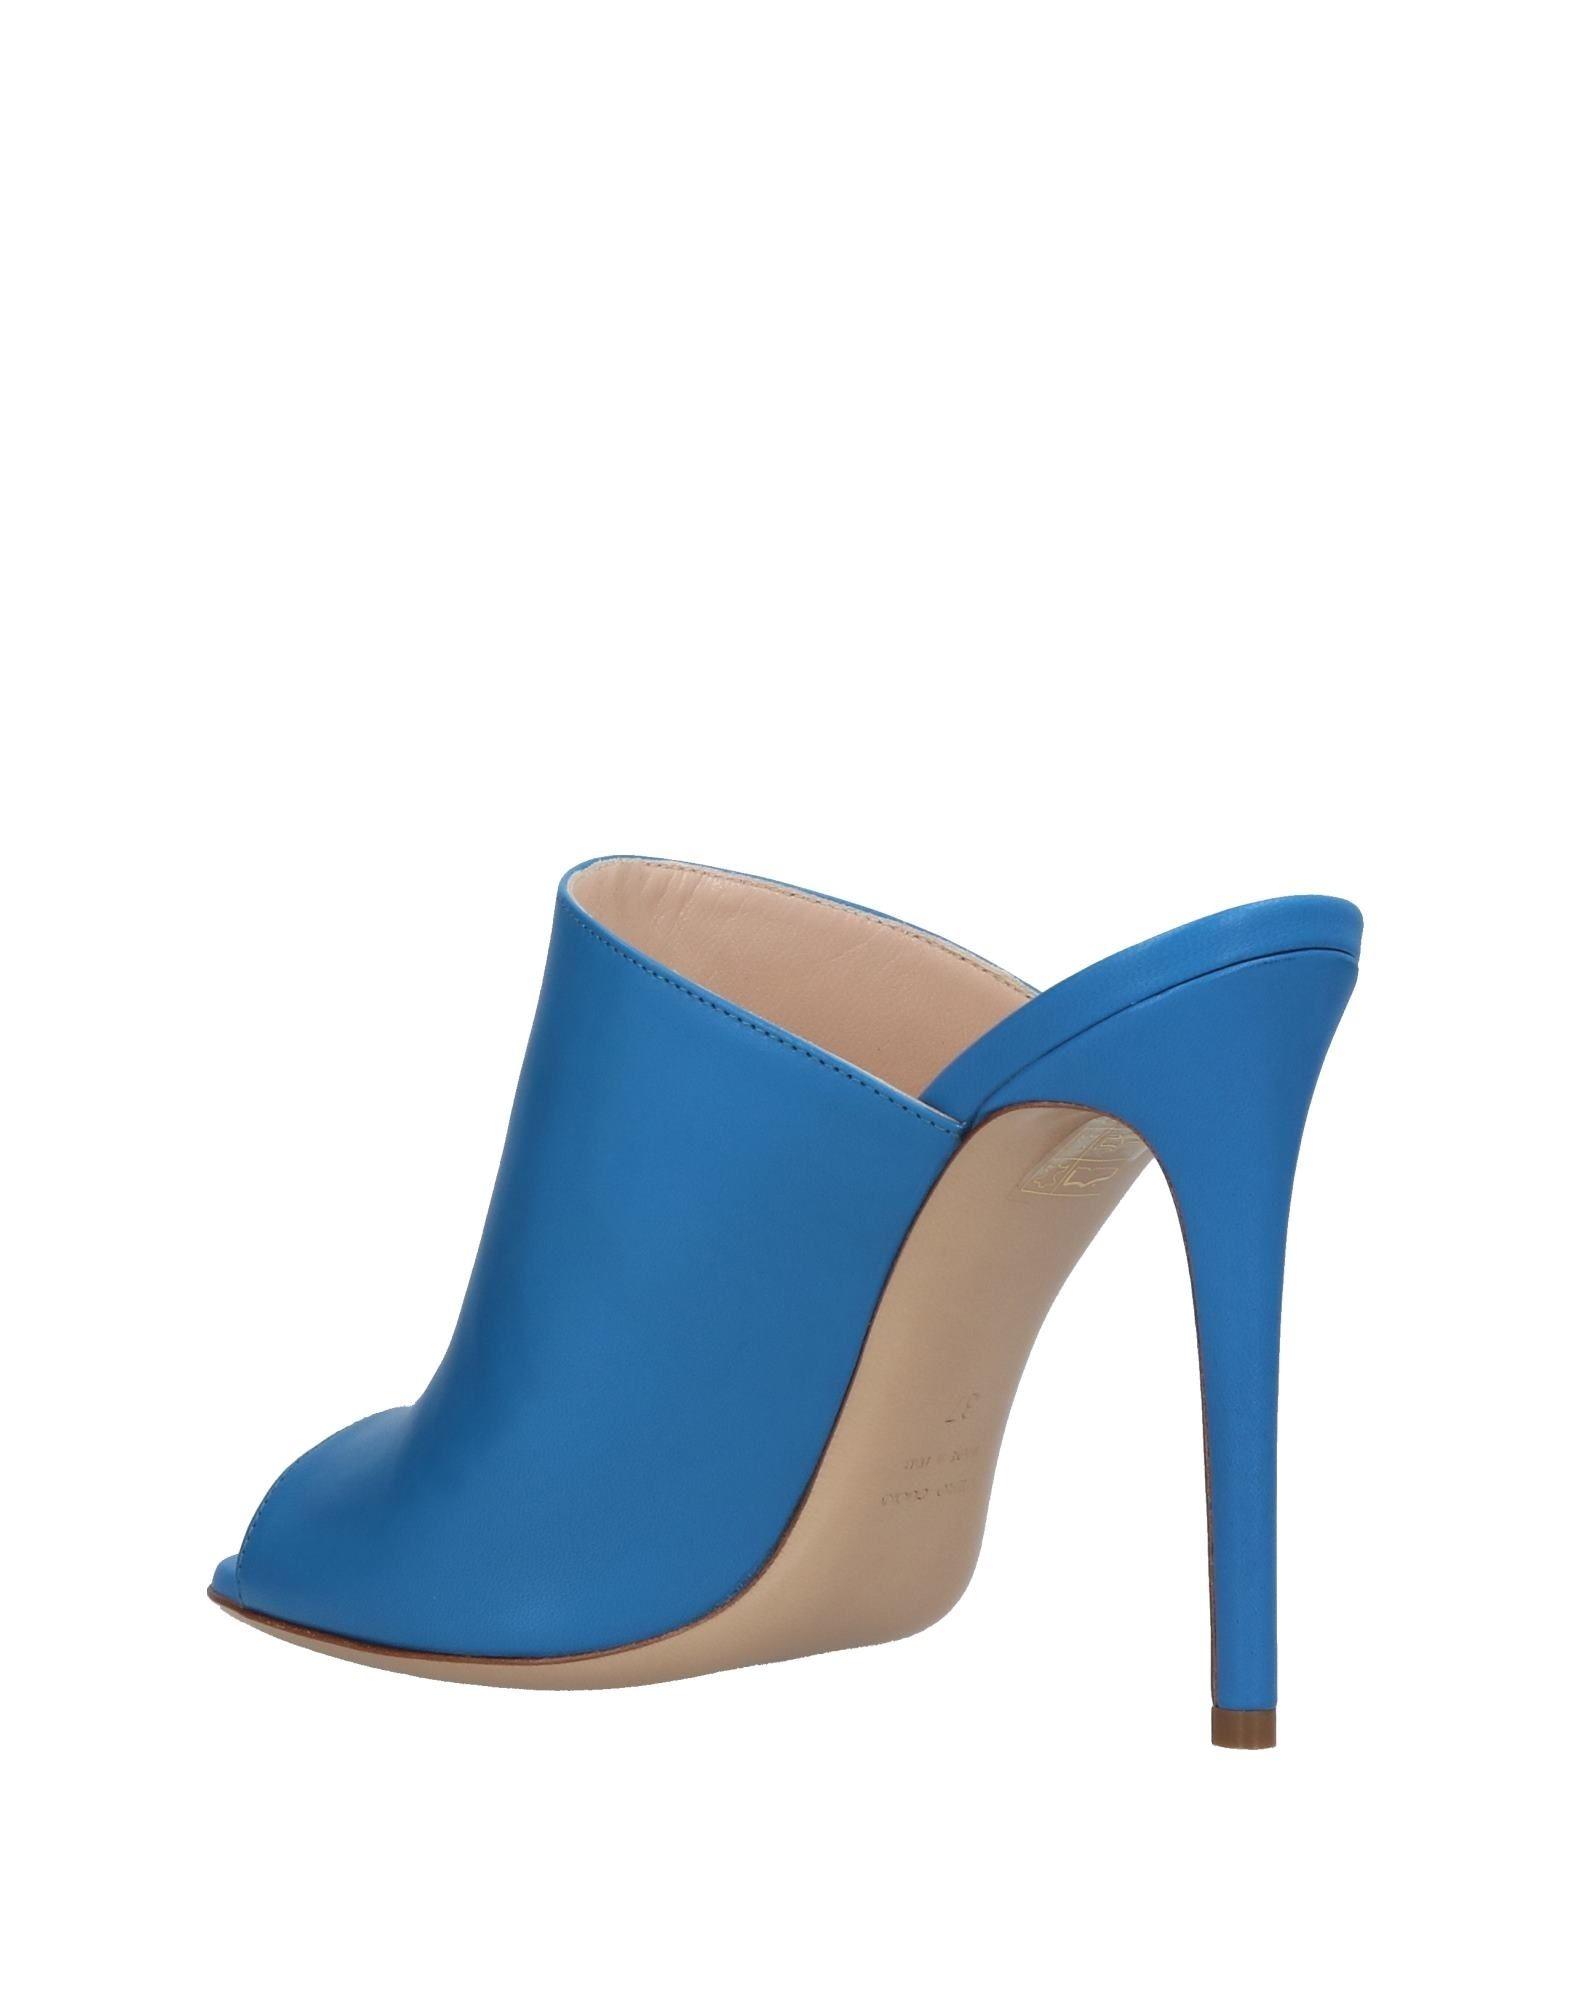 Deimille Sandalen Damen  11374807GF Gute Qualität beliebte Schuhe